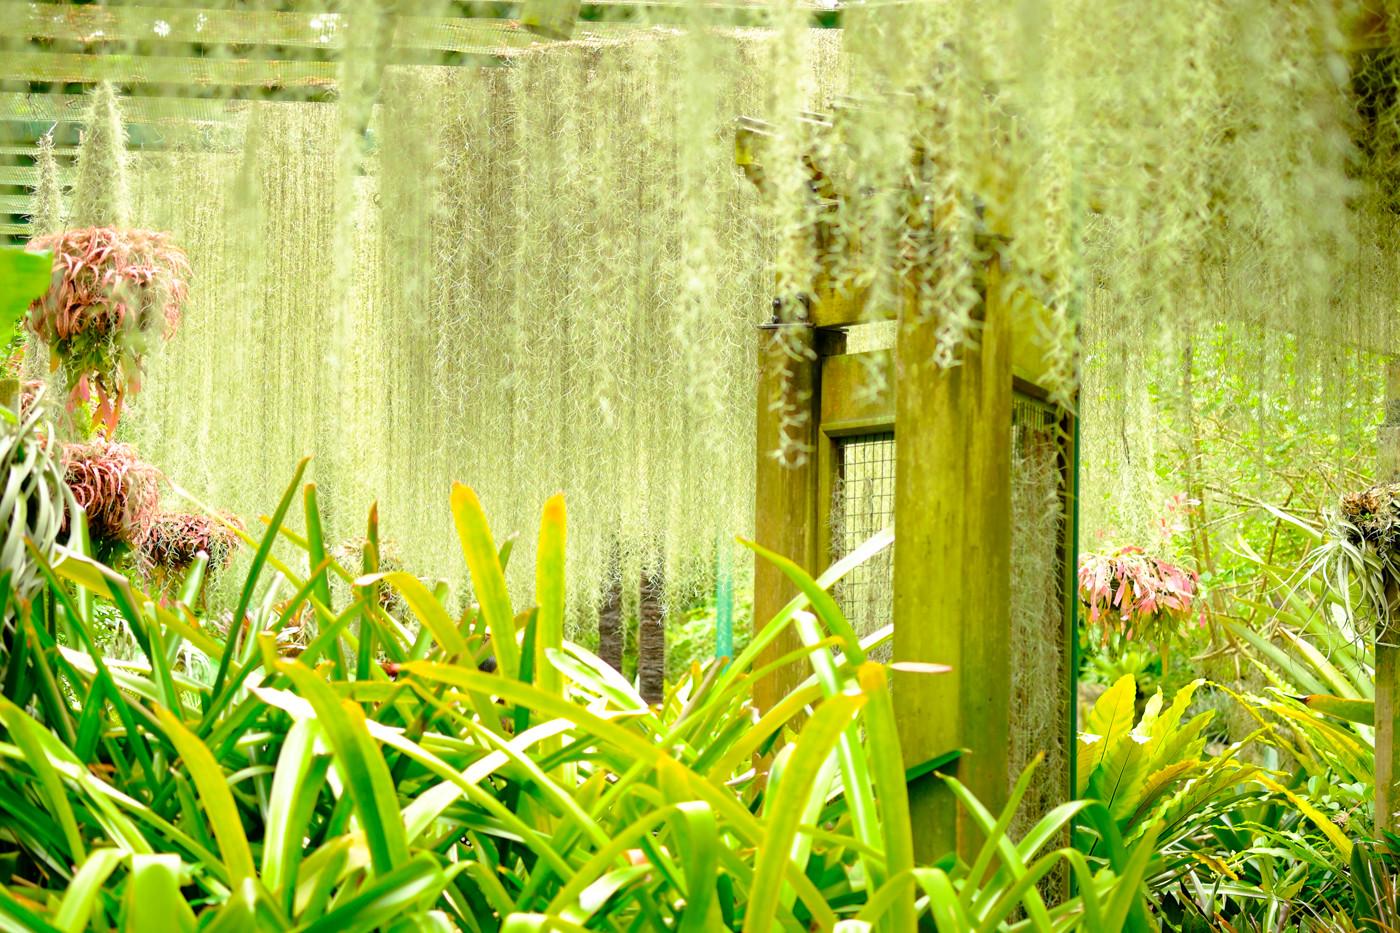 xf60mm f2.4 r macroの作例 レビュー 解像力 風景 シンガポール 植物